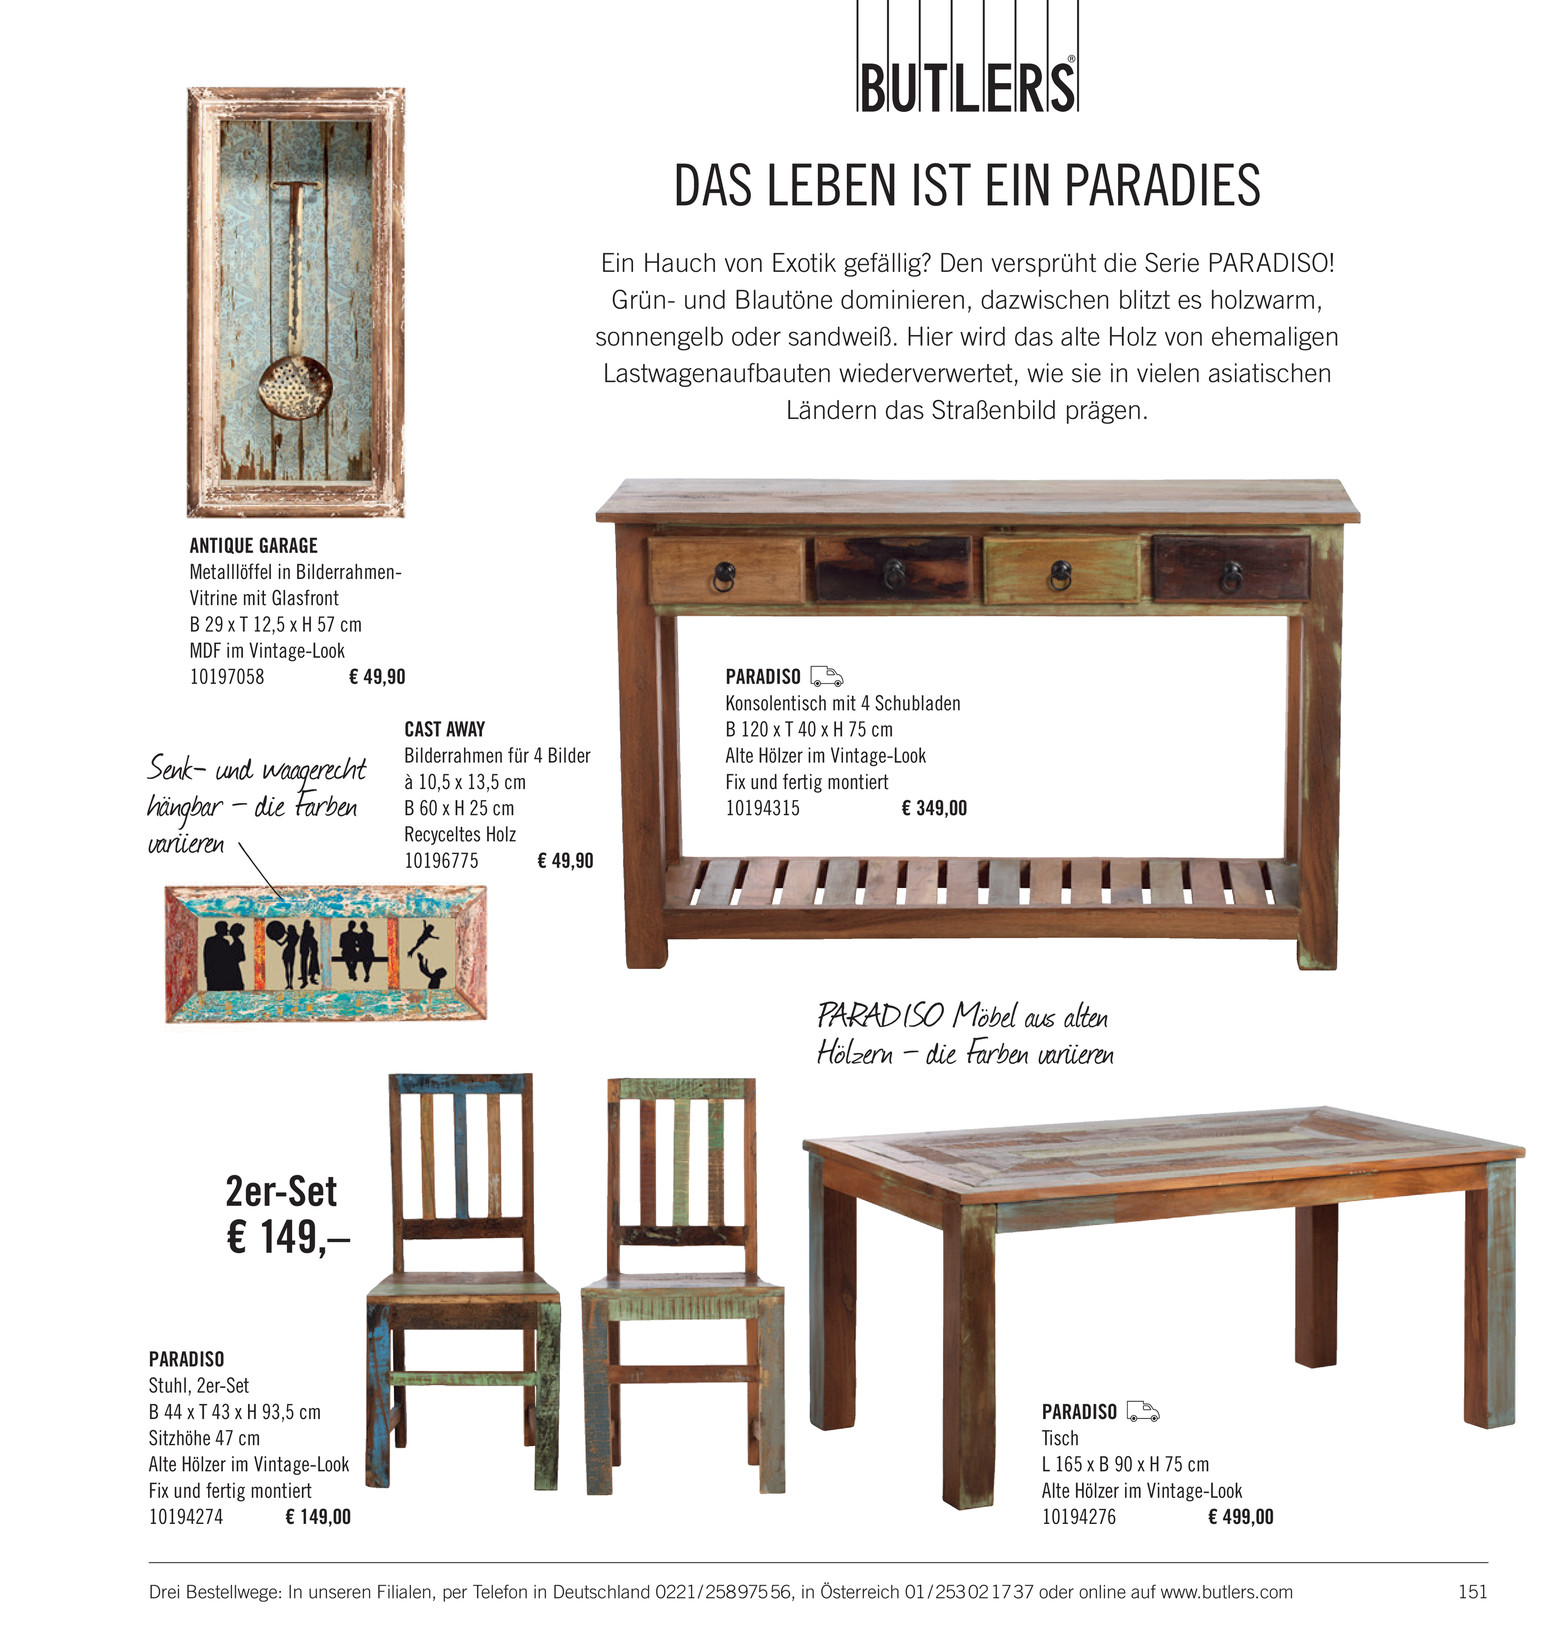 Butlers Katalog De Wohnst Cke Katalog 2014 Seite 150 151